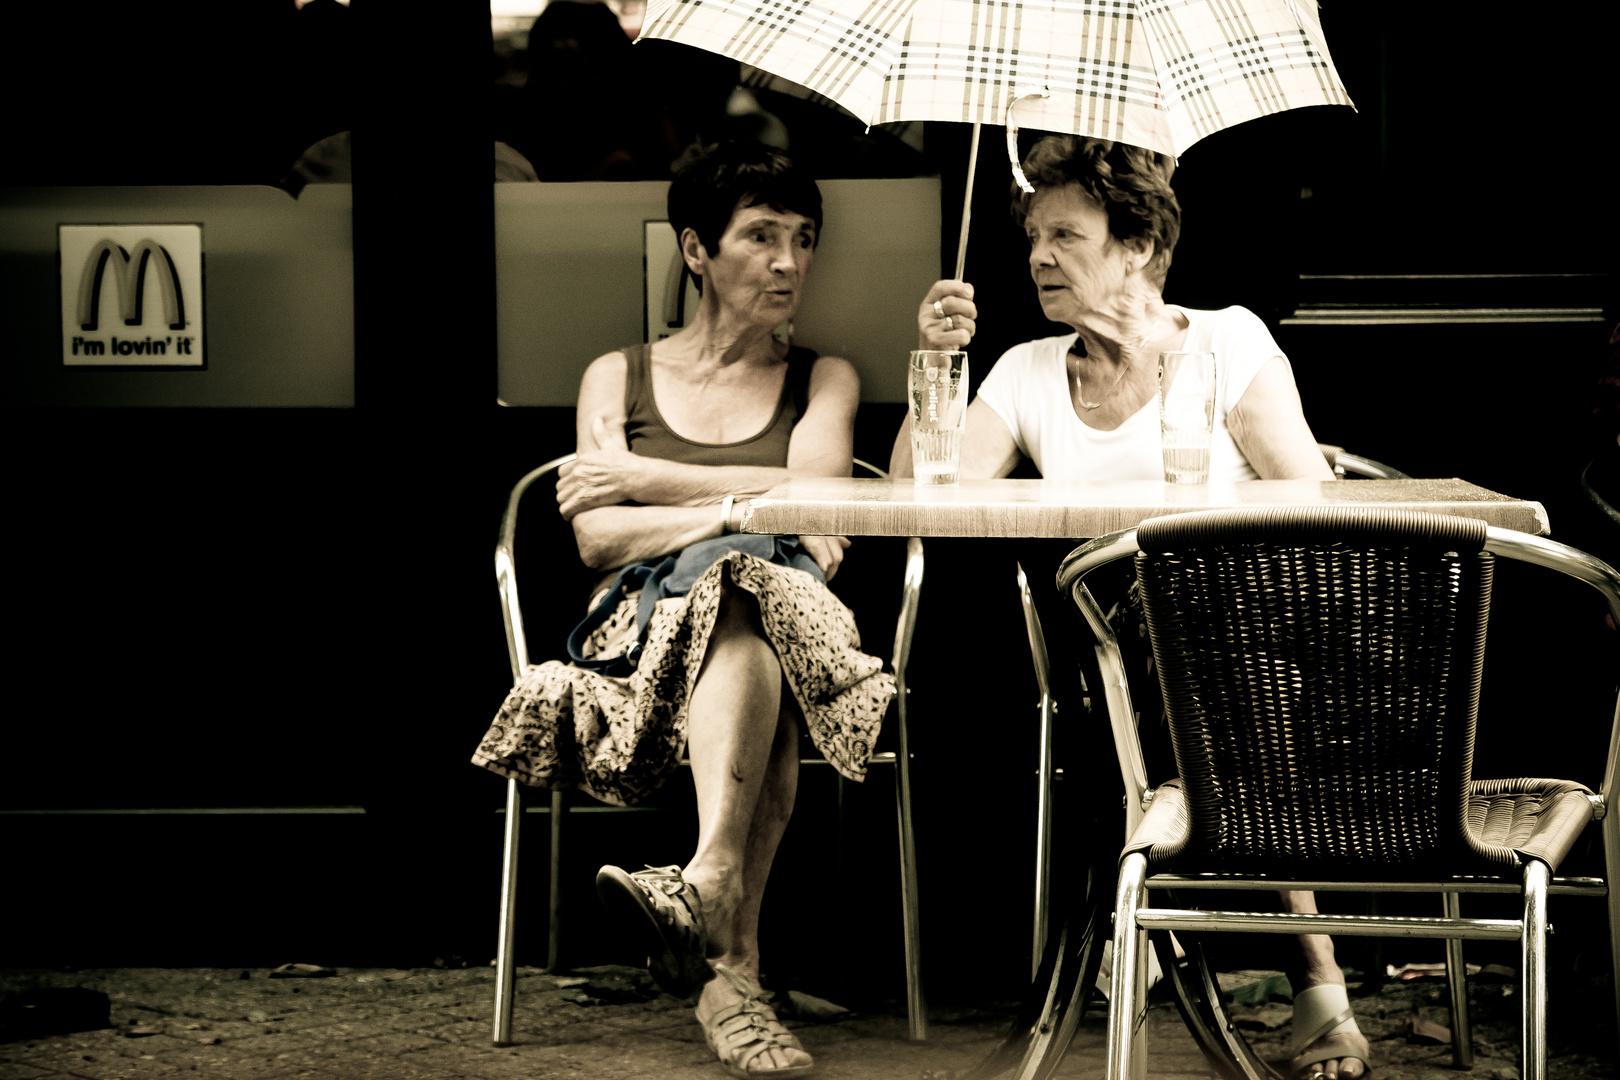 street (10) - drinking in the rain